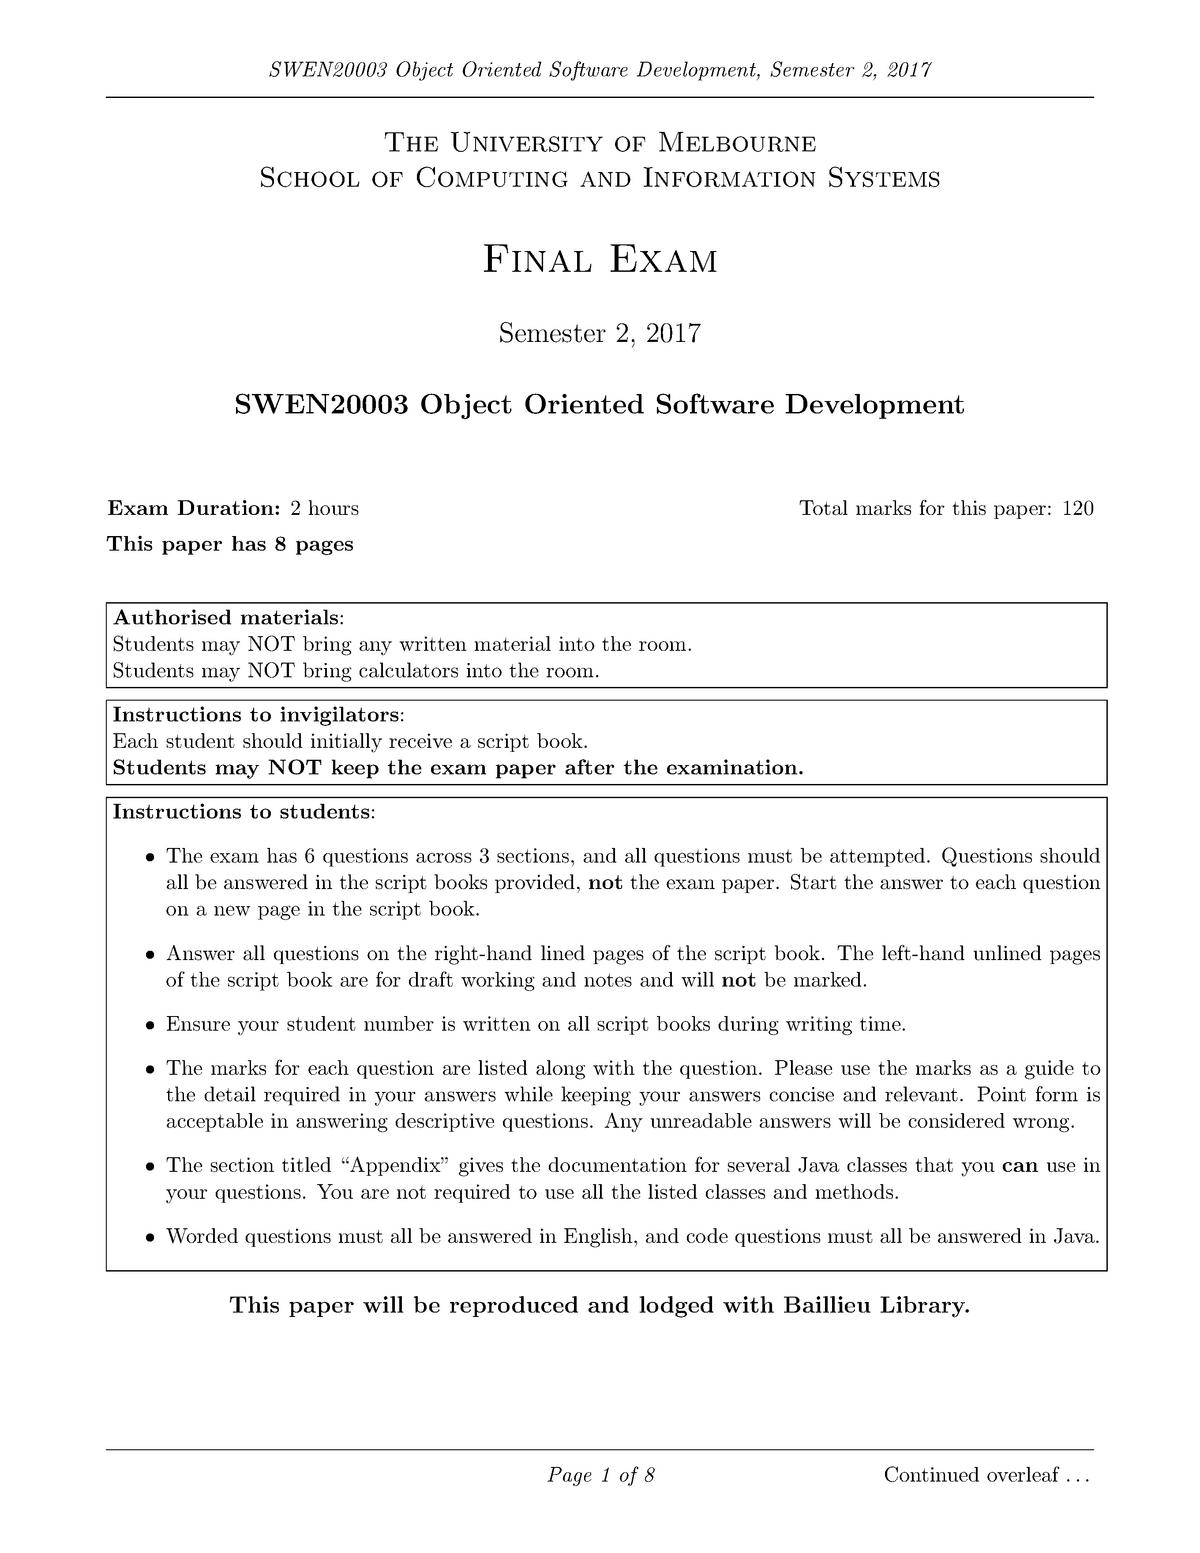 Exam 2017 - SWEN20003: Object-Oriented Software Development